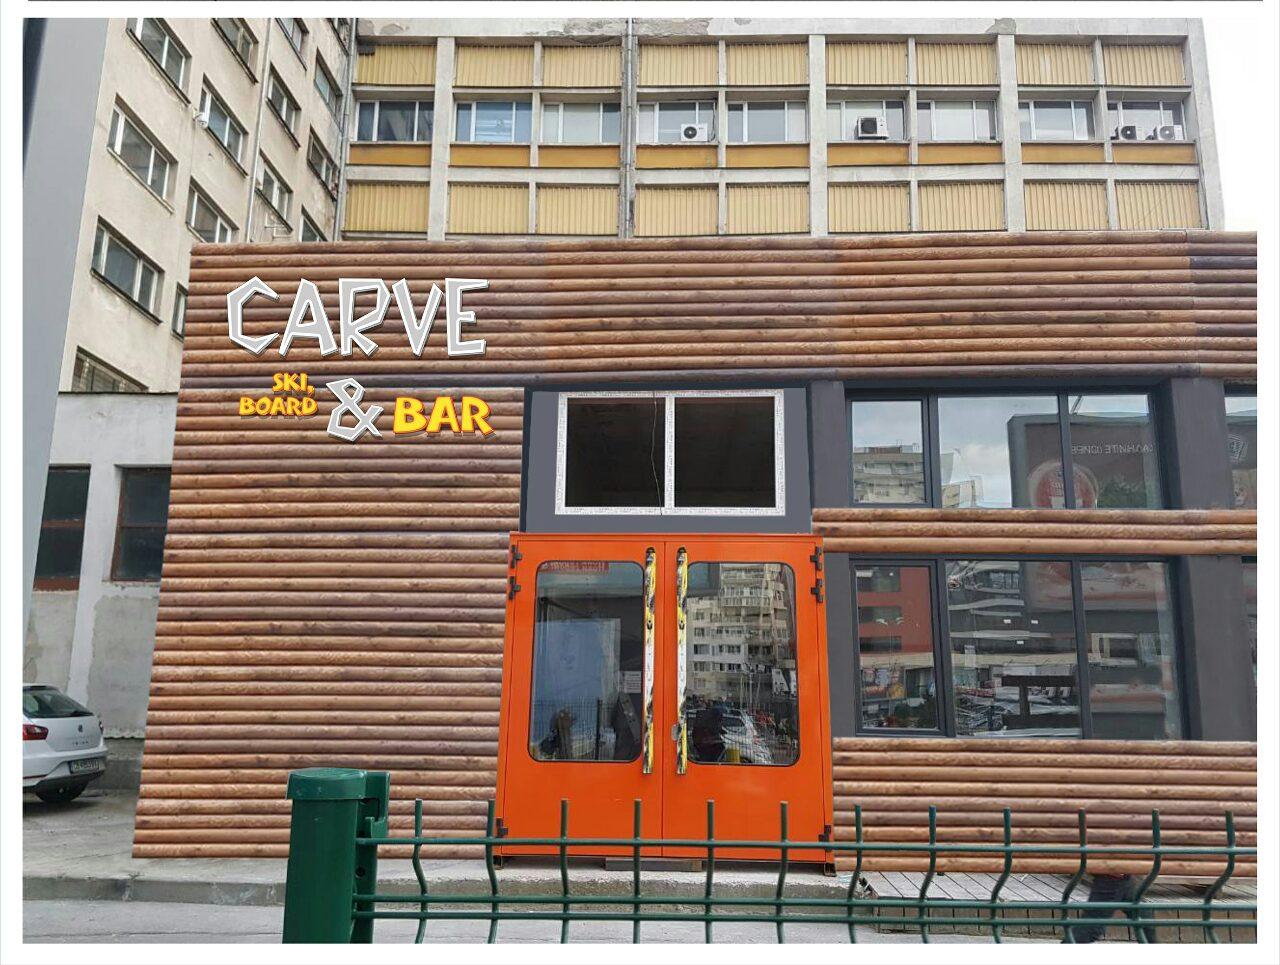 Carve Ski Board &Bar